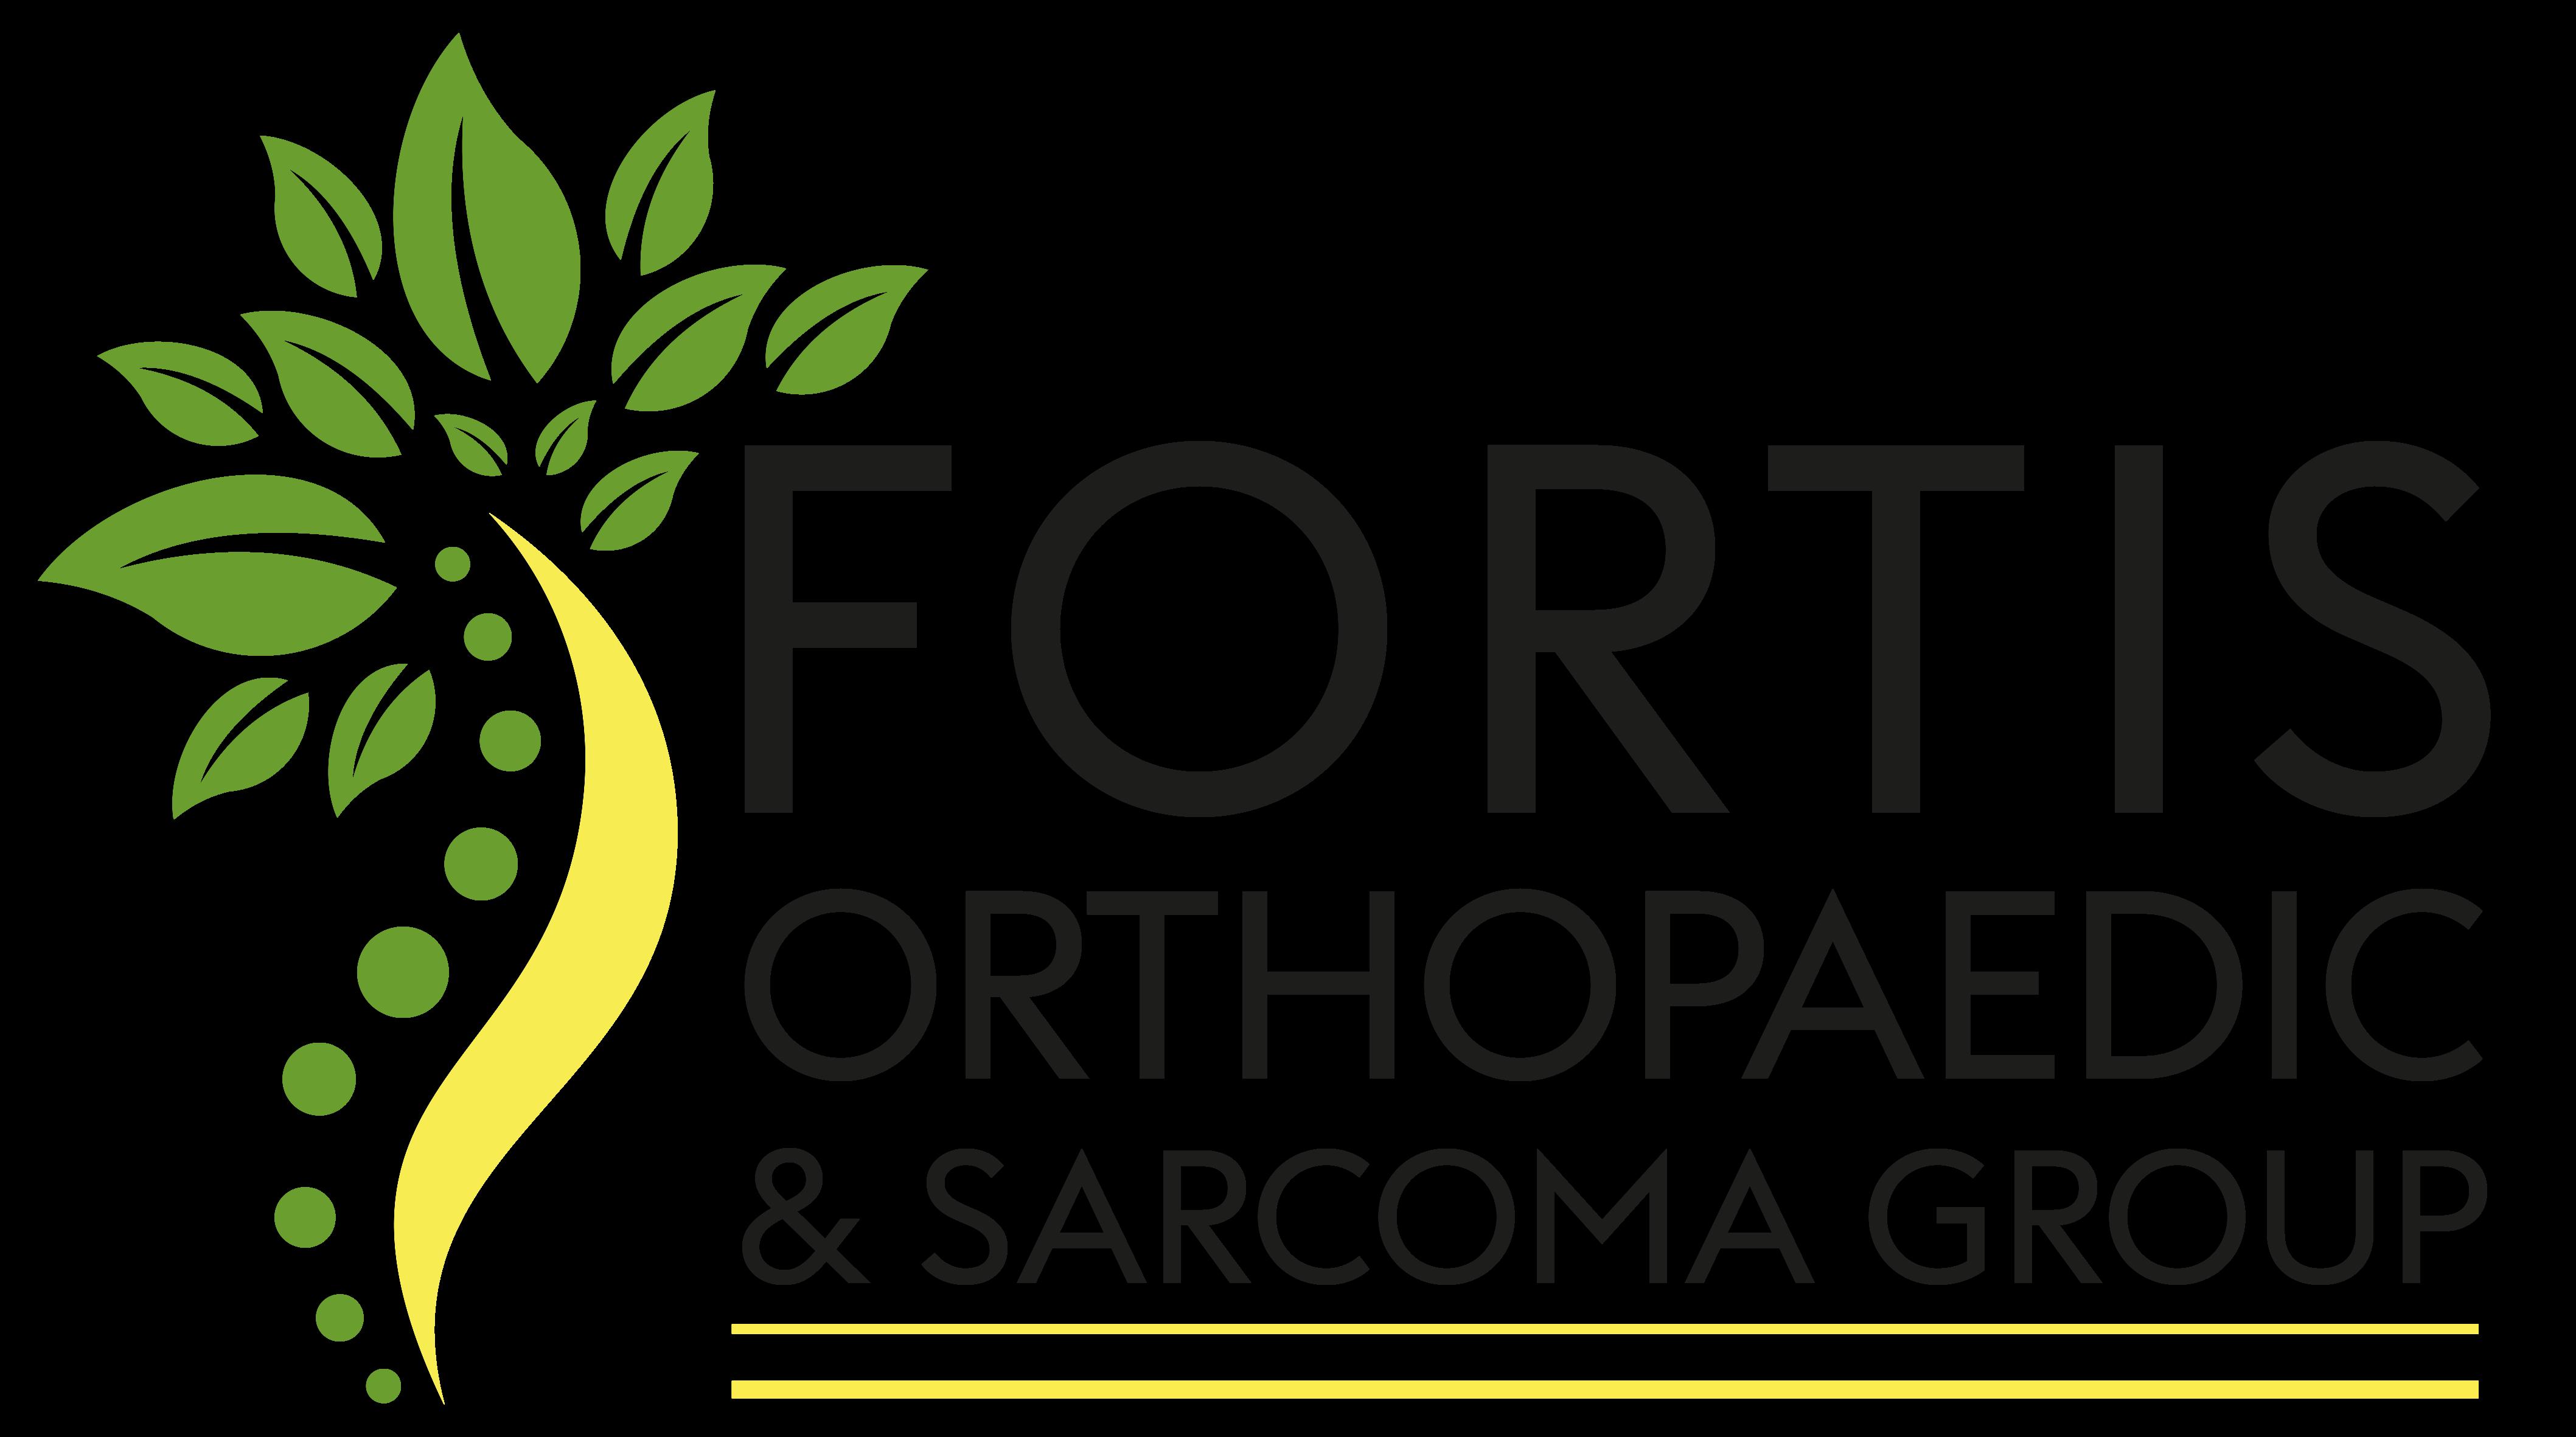 FORTIS ORTHOPAEDIC & SARCOMA GROUP